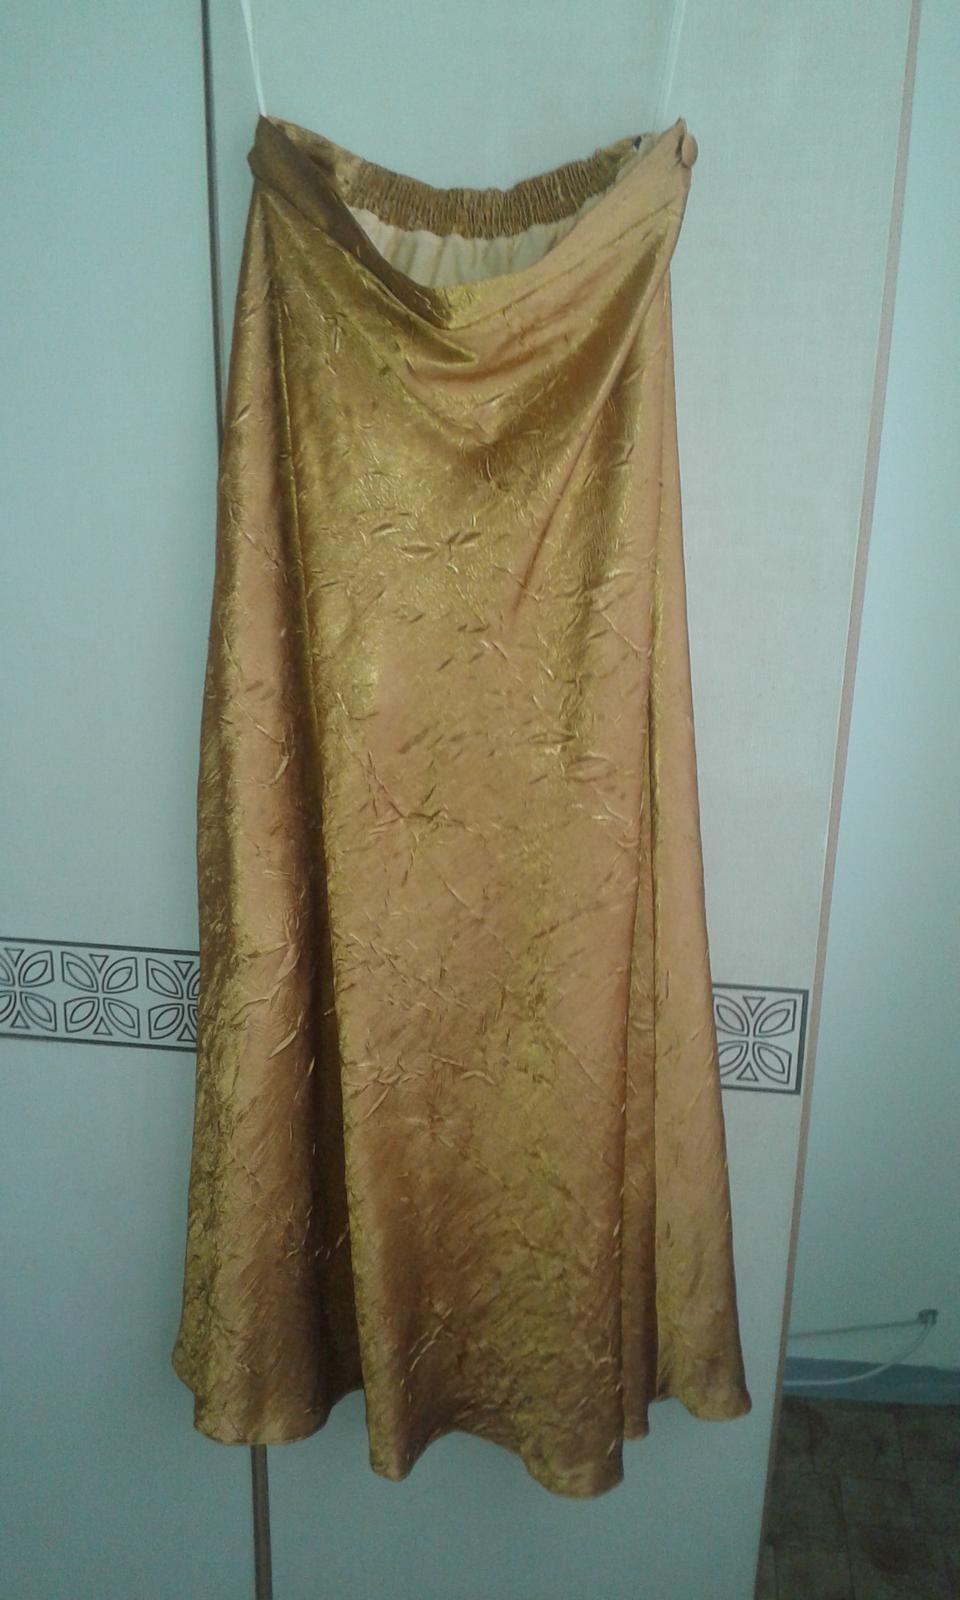 Zlaté príležitostné šaty č.XL - Obrázok č. 3